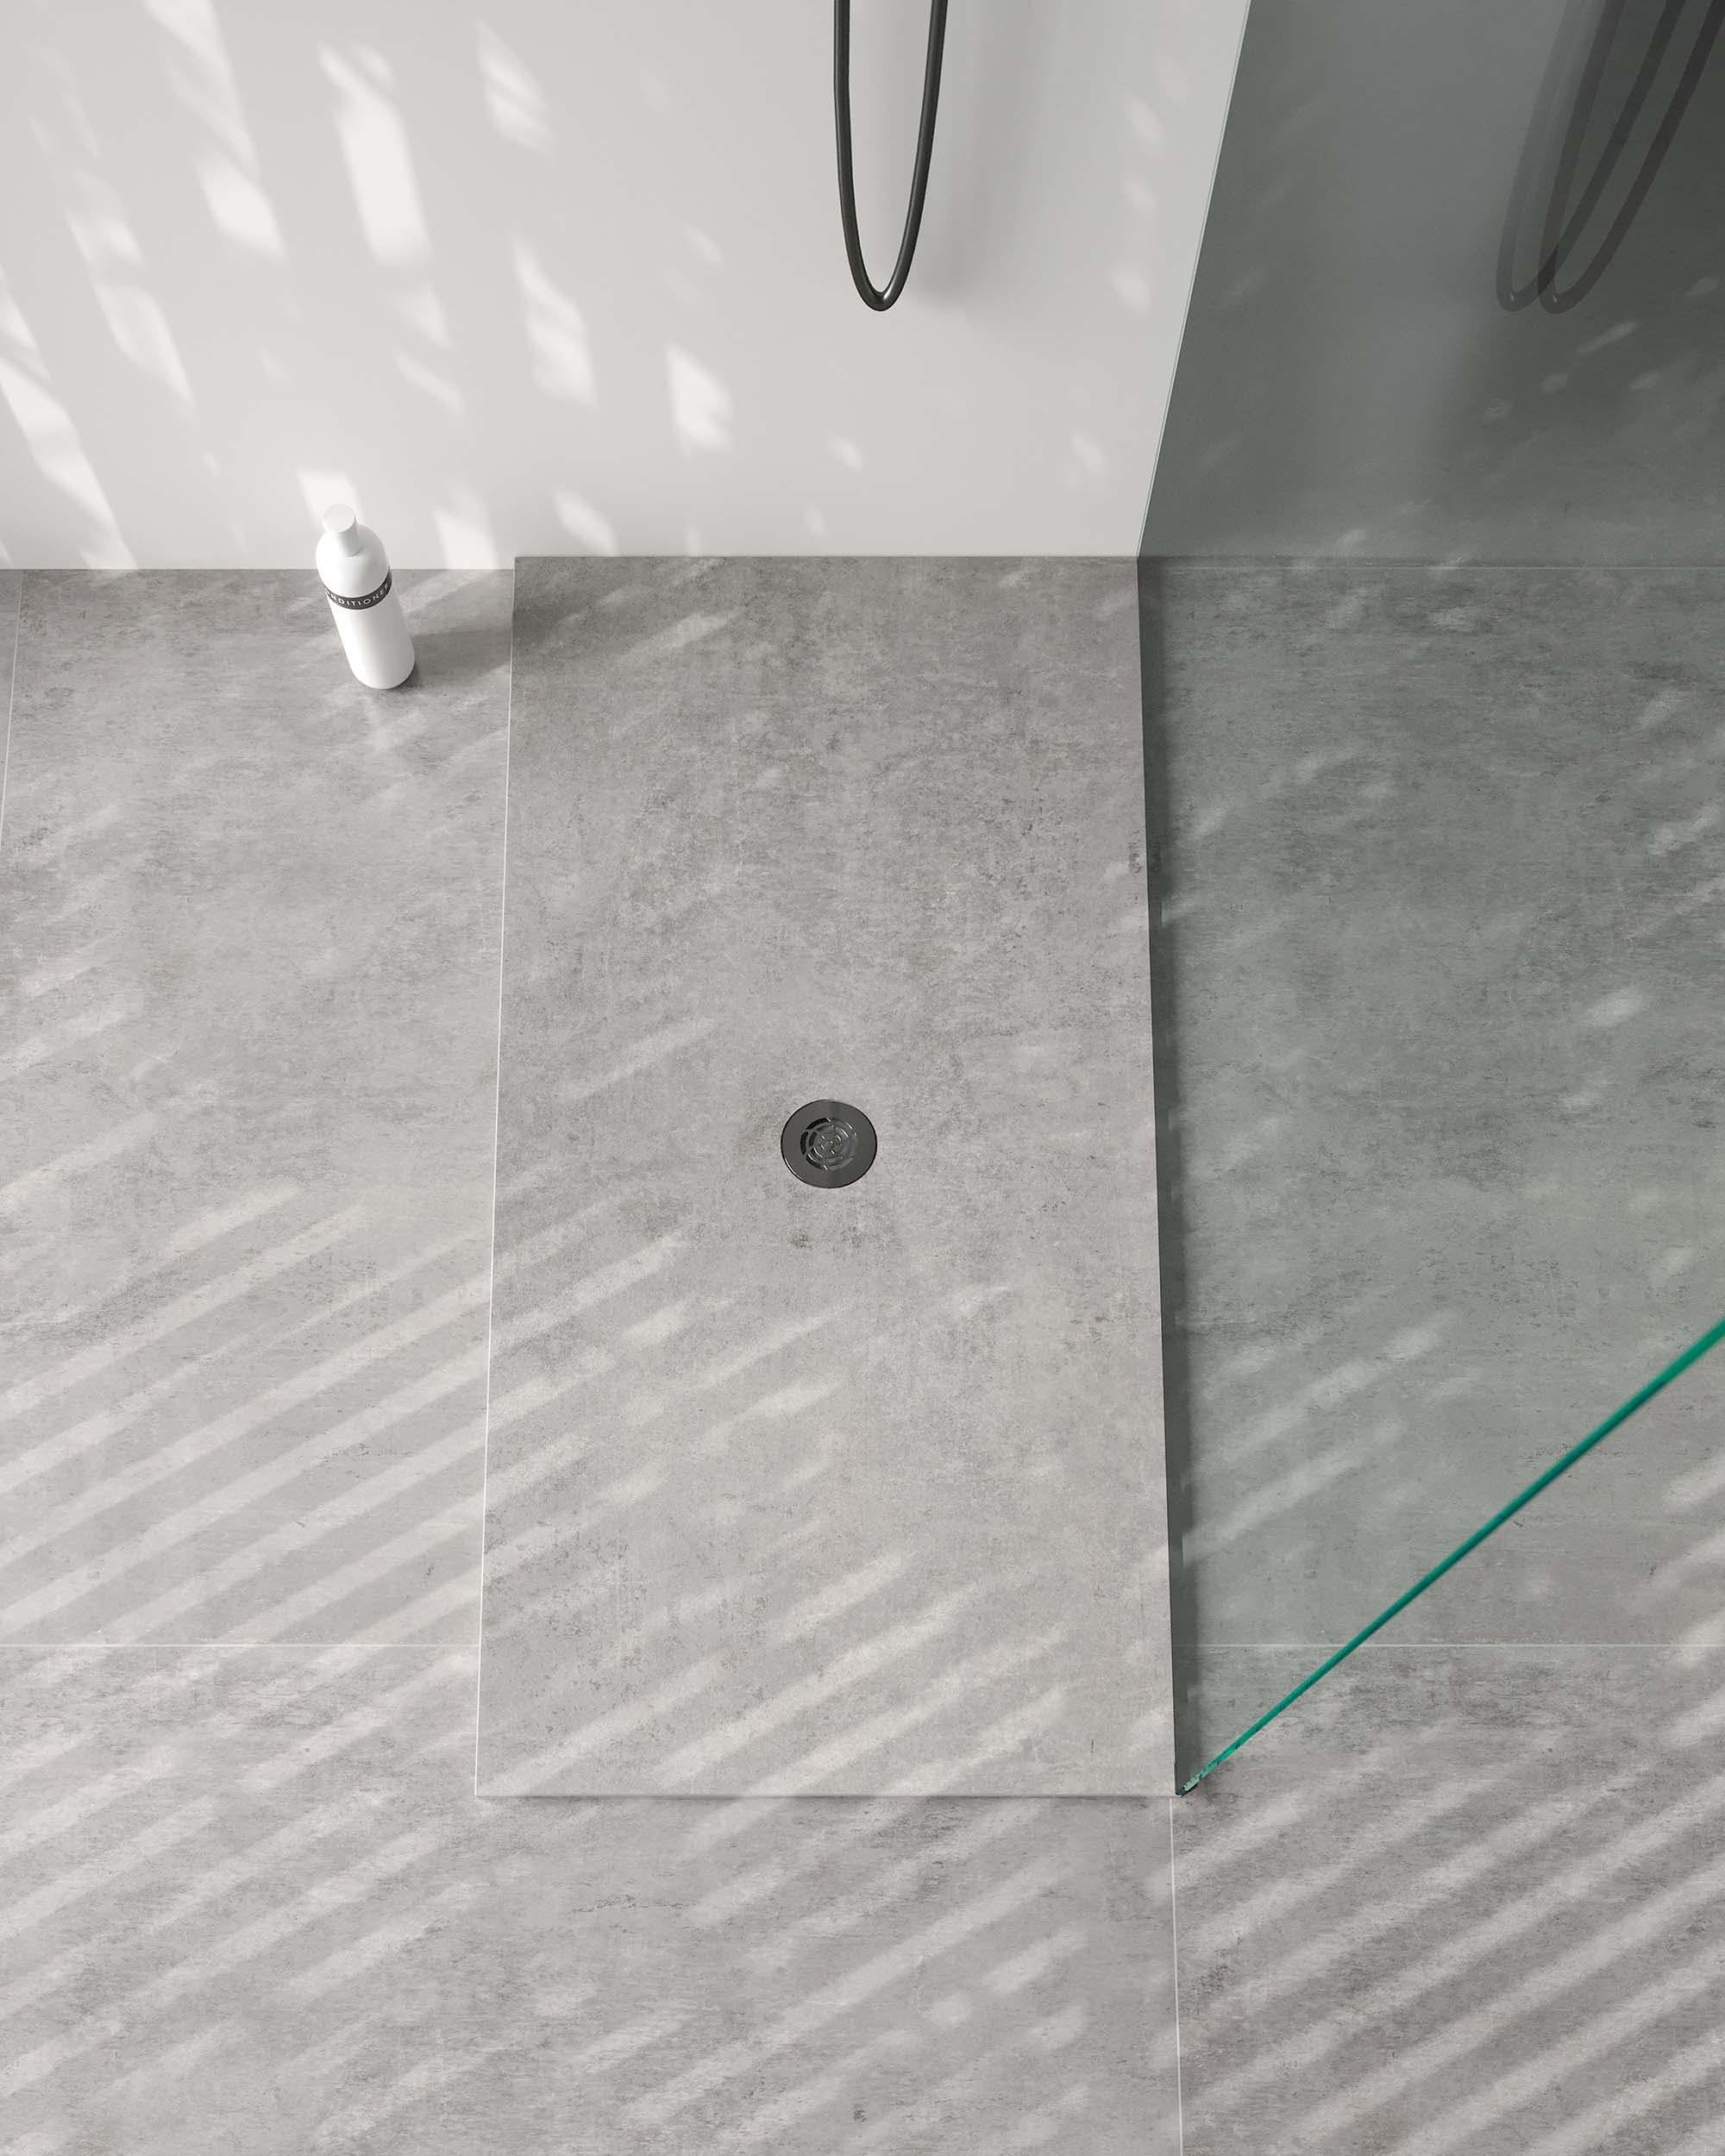 Image of Dekton Bathroom Kreta Plato de Ducha Gocce Kreta baja 4 in Cosentino at KBIS 2021 - Cosentino